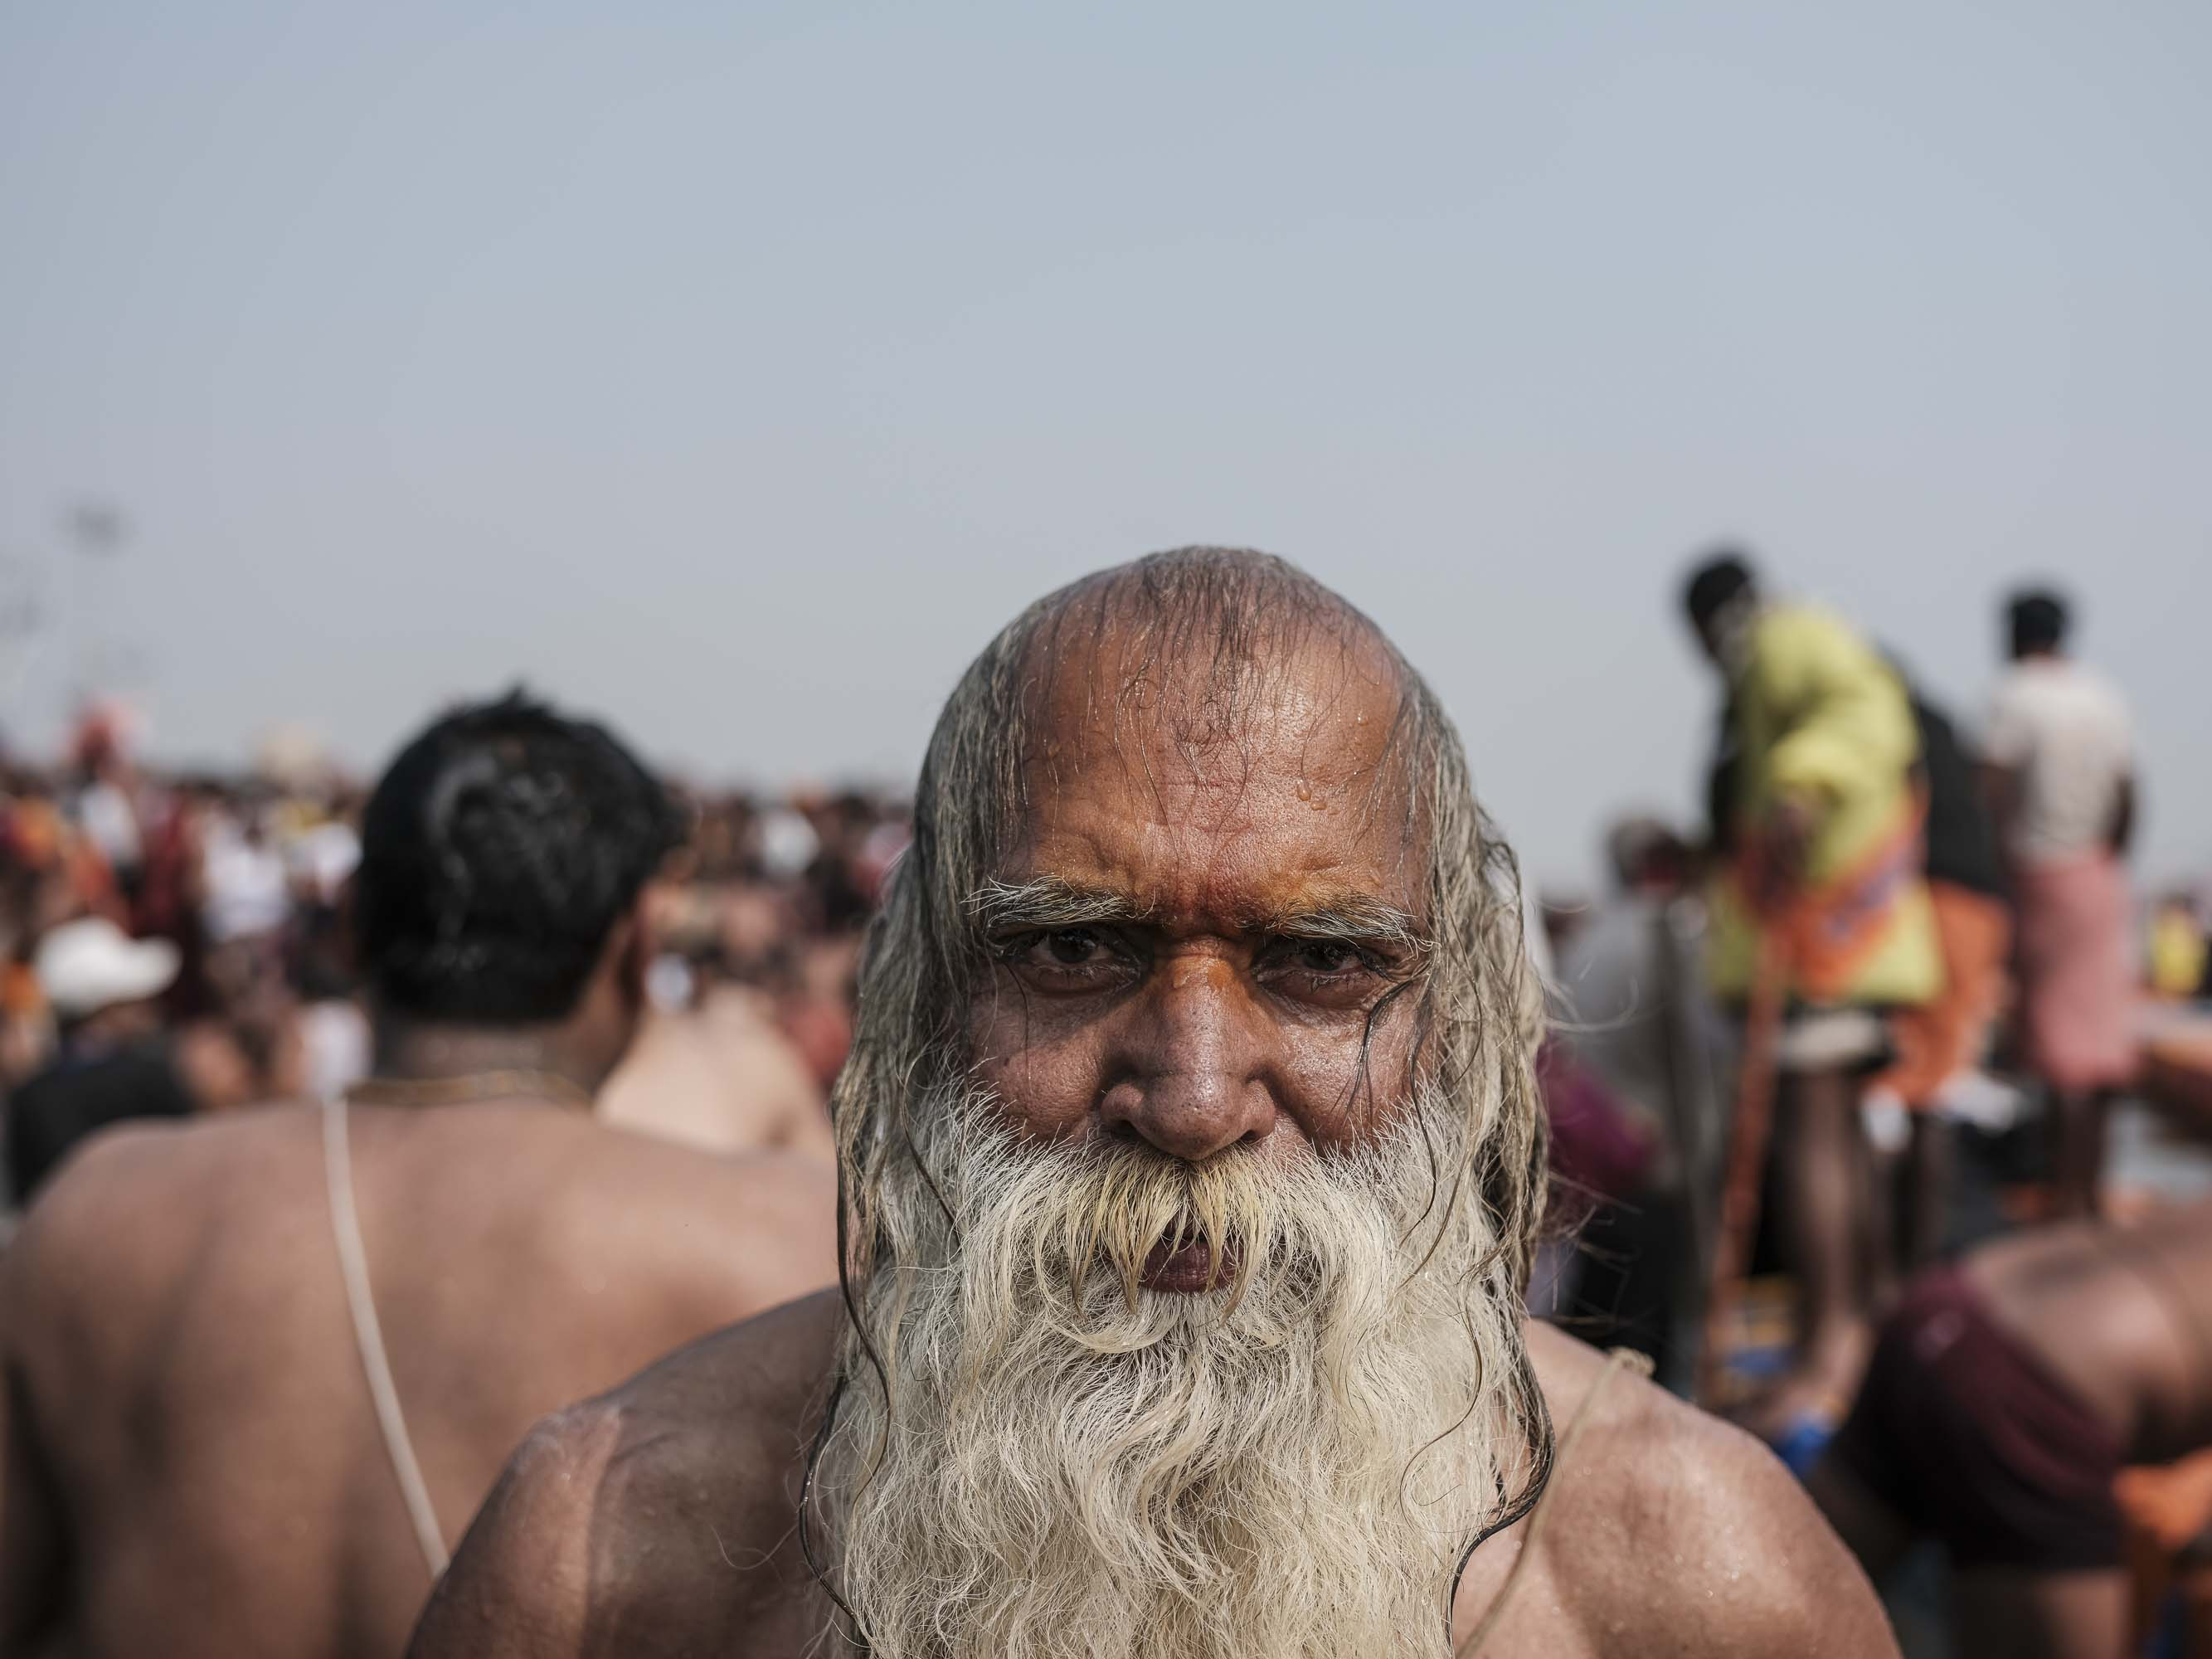 portrait Man crowed pilgrims Kumbh mela 2019 India Allahabad Prayagraj Ardh hindu religious Festival event rivers photographer jose jeuland photography